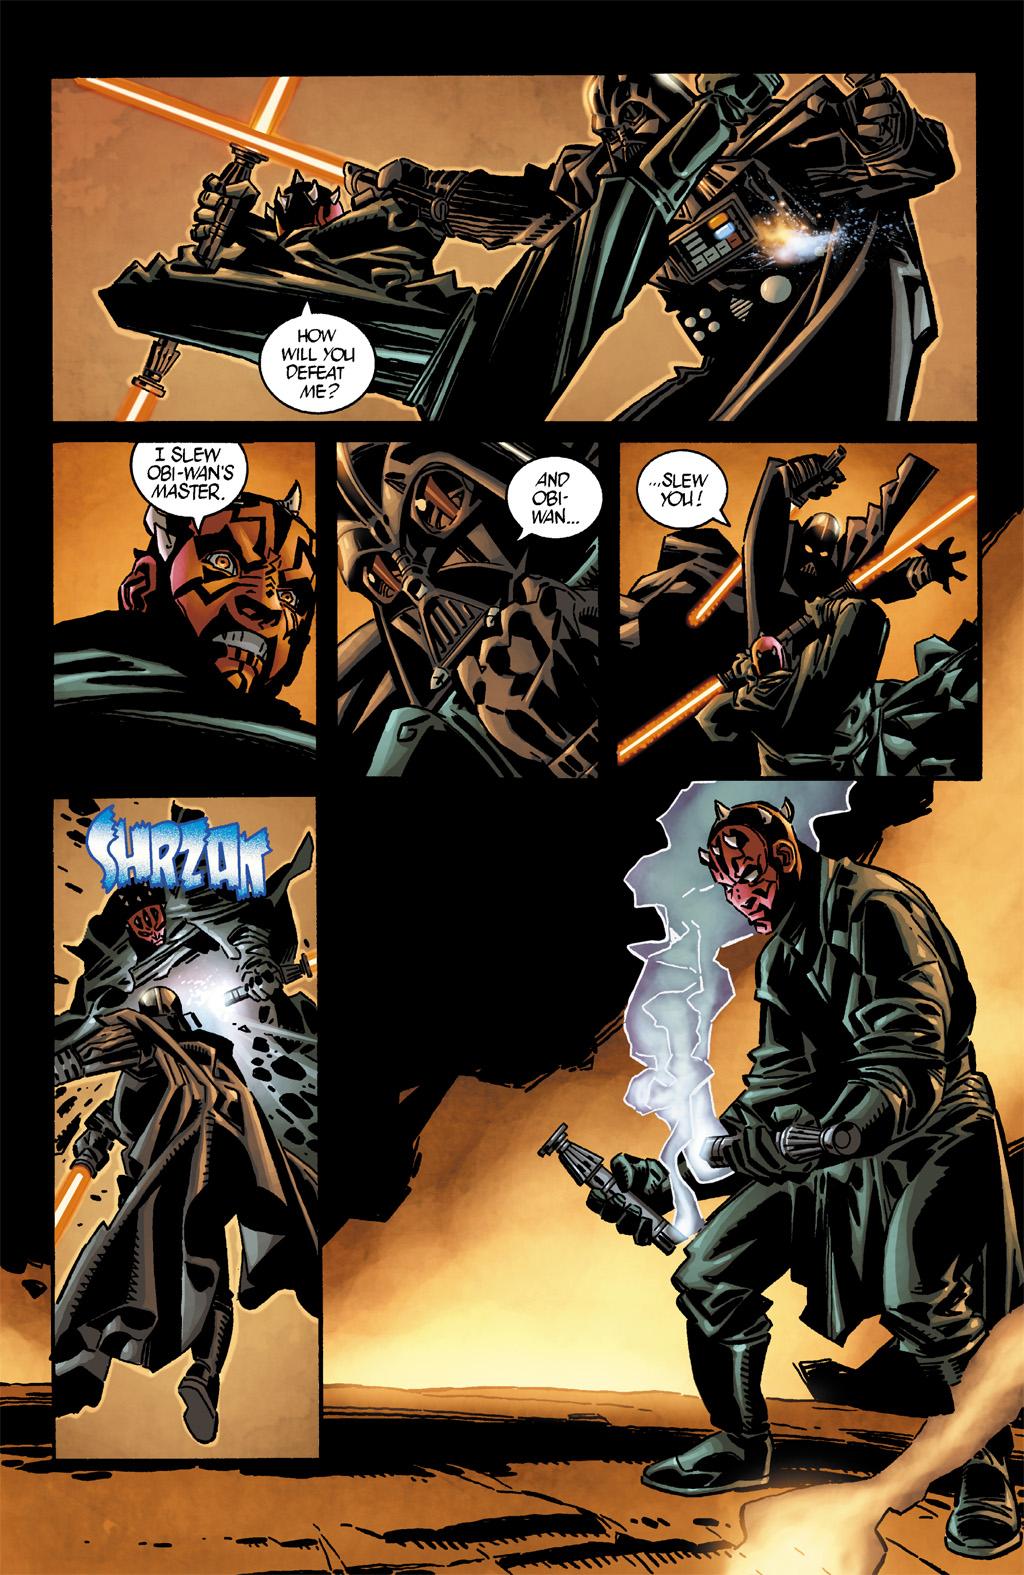 RotJ Darth Vader and RotJ Luke Skywalker vs SoD Darth Maul and Savage Opress - Page 3 Rco03810